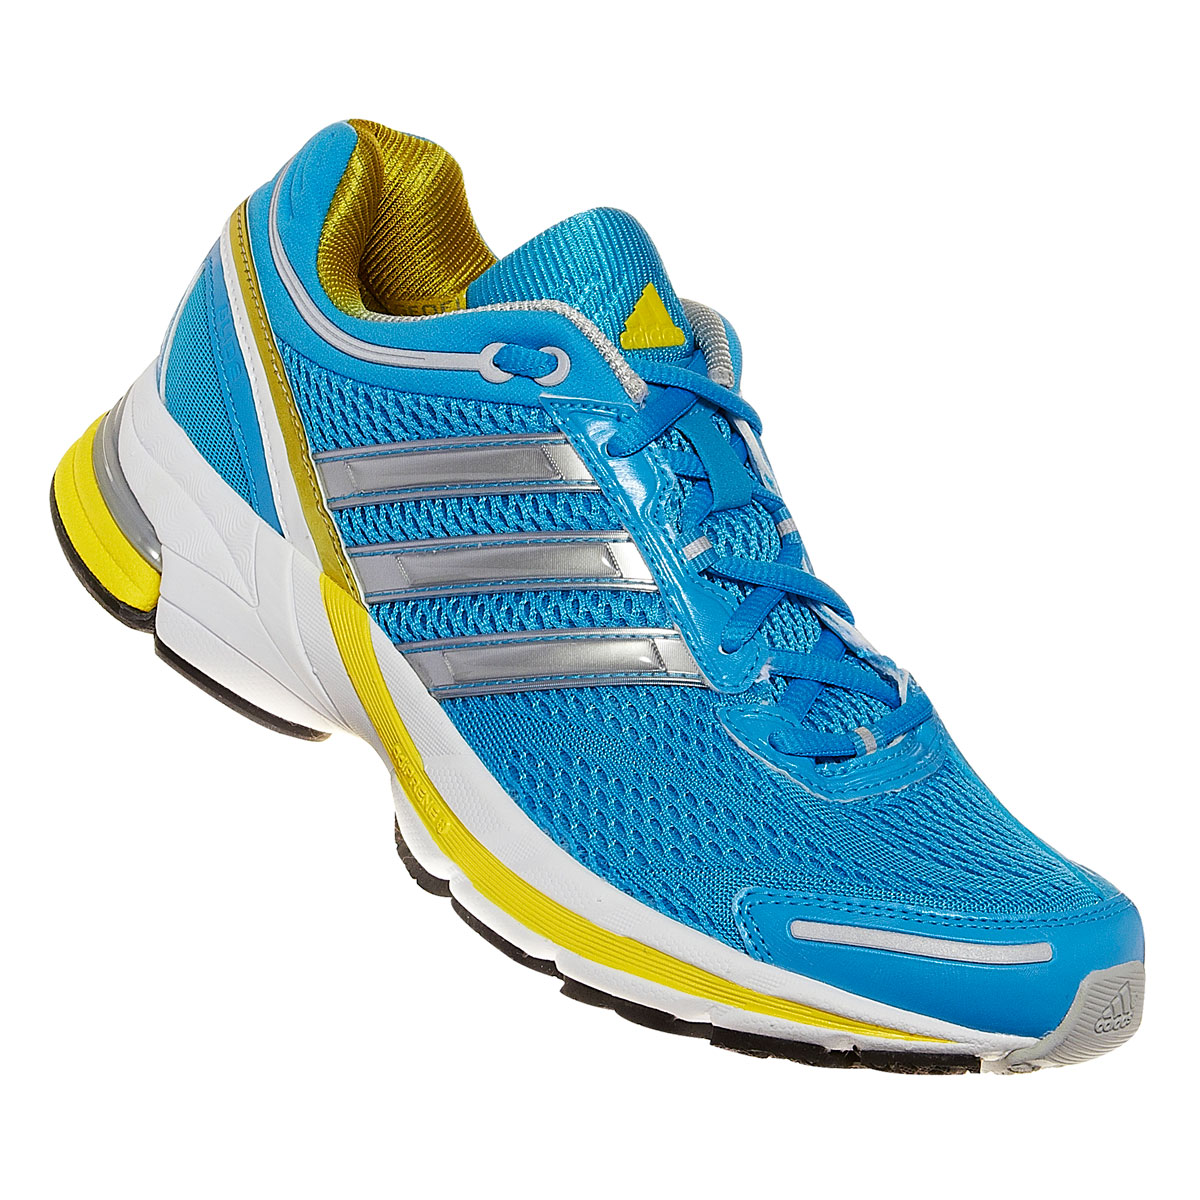 9cd6b4f5476 Image SEO all 2  Tenis adidas